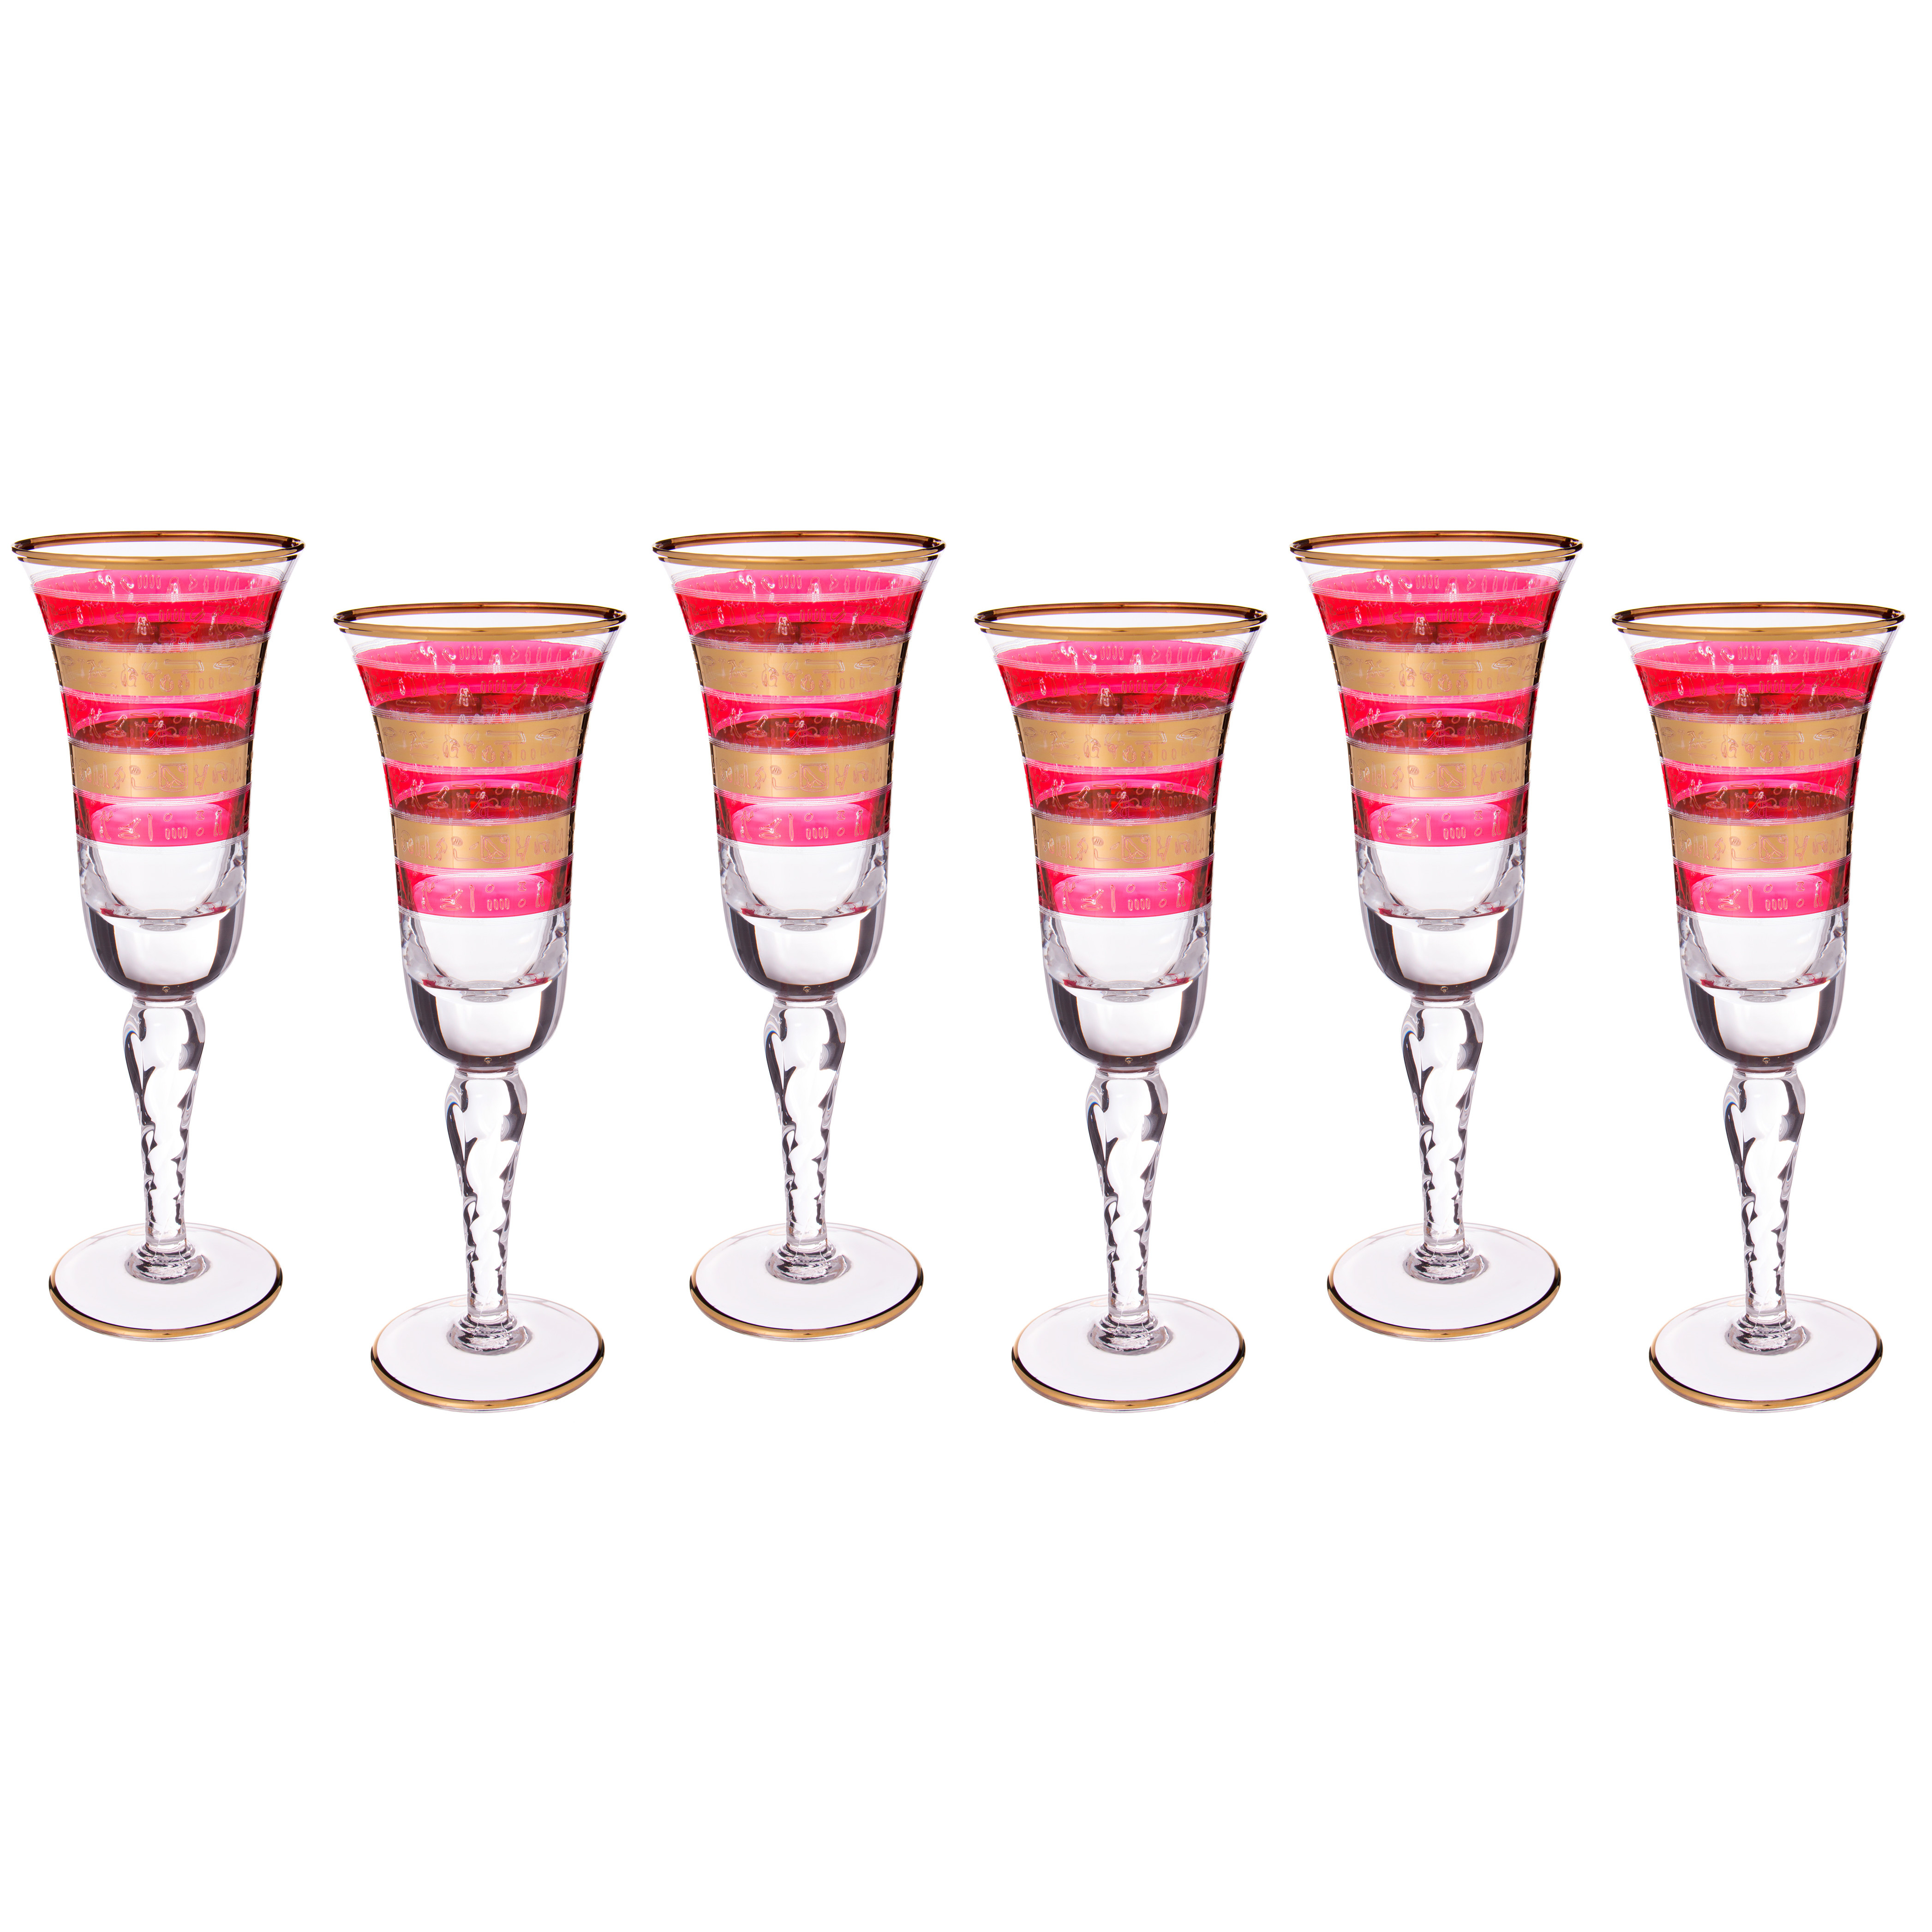 {} Same Набор бокалов для шампанского Vonnie (250 мл - 6 шт)